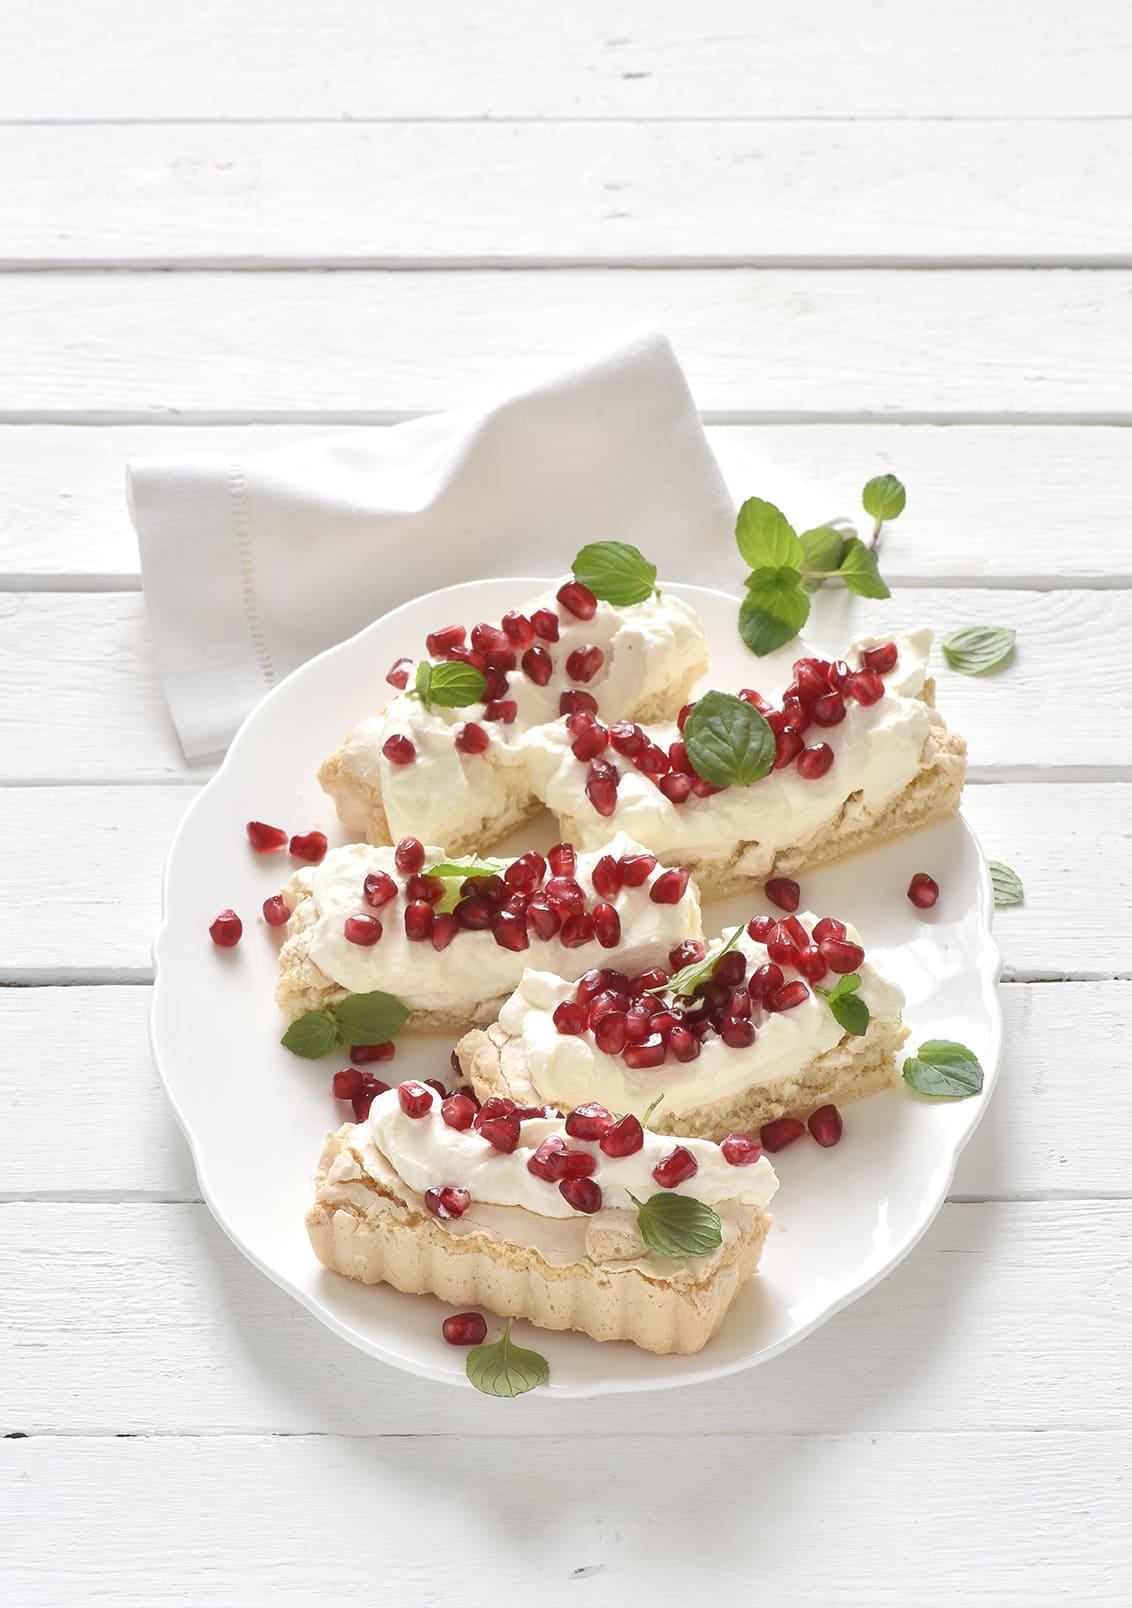 Makronen von Antje Plewinski Foodfotografie